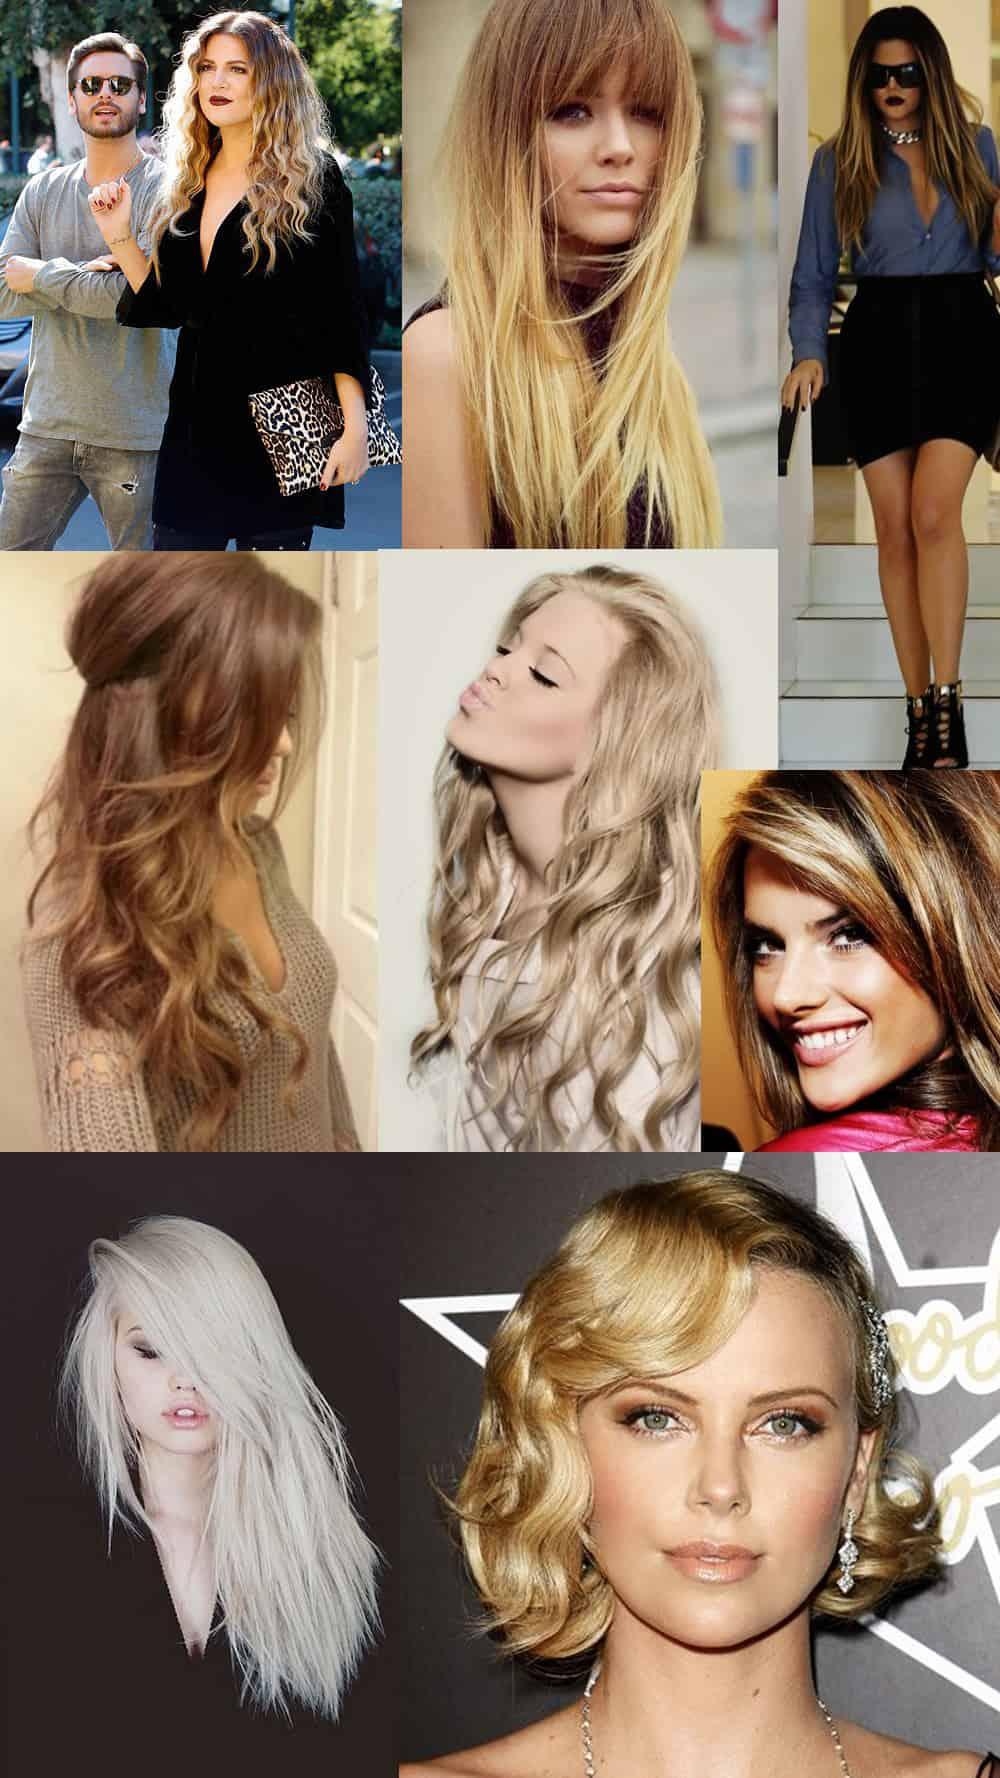 blondes-versus-brunettes